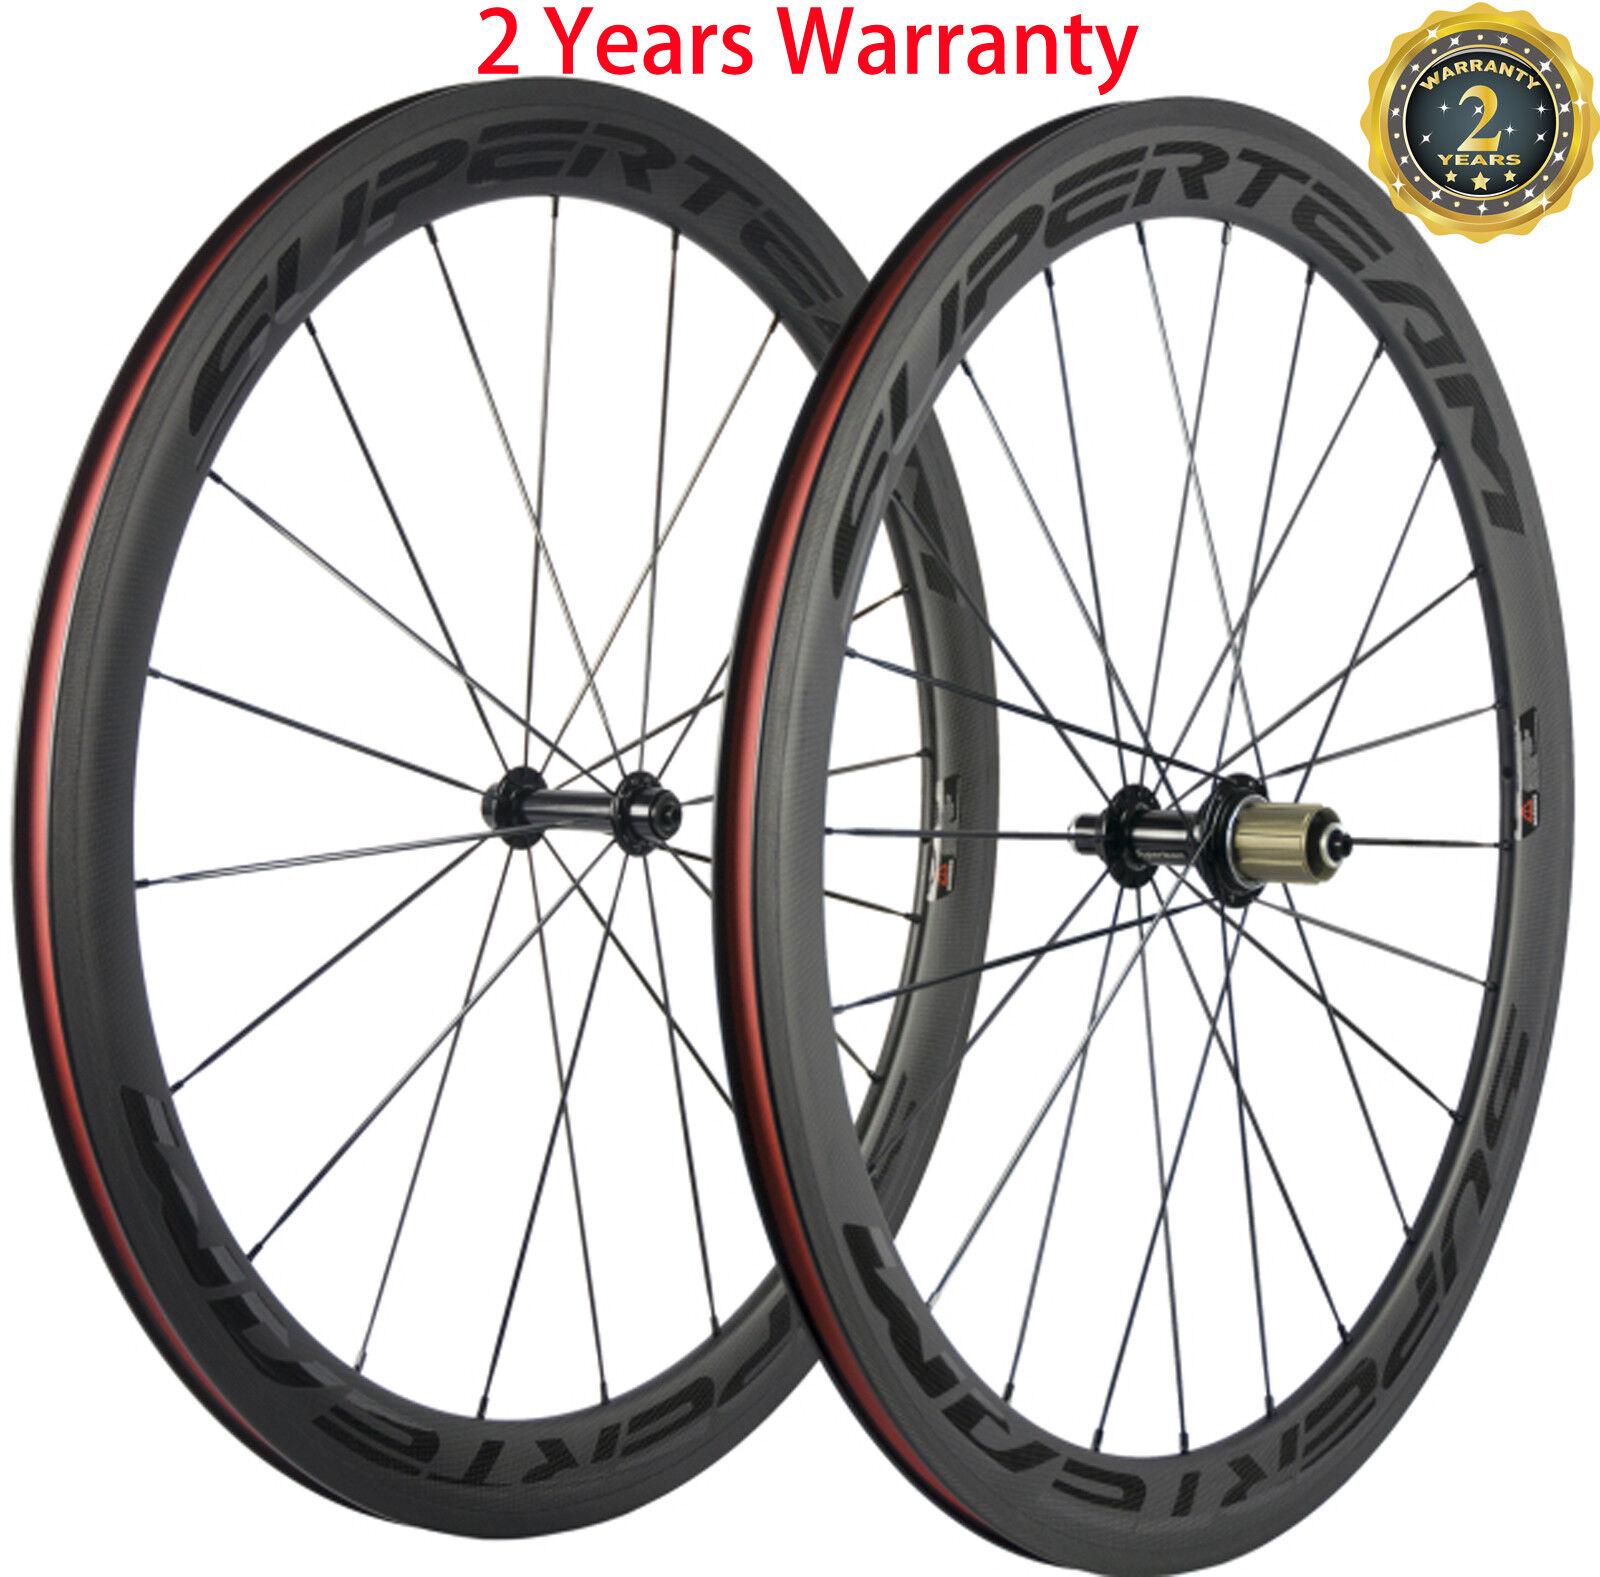 50mm Clincher Bicycle Wheelset Full Carbon Fiber Wheelset 700C Shimano 3K Matte